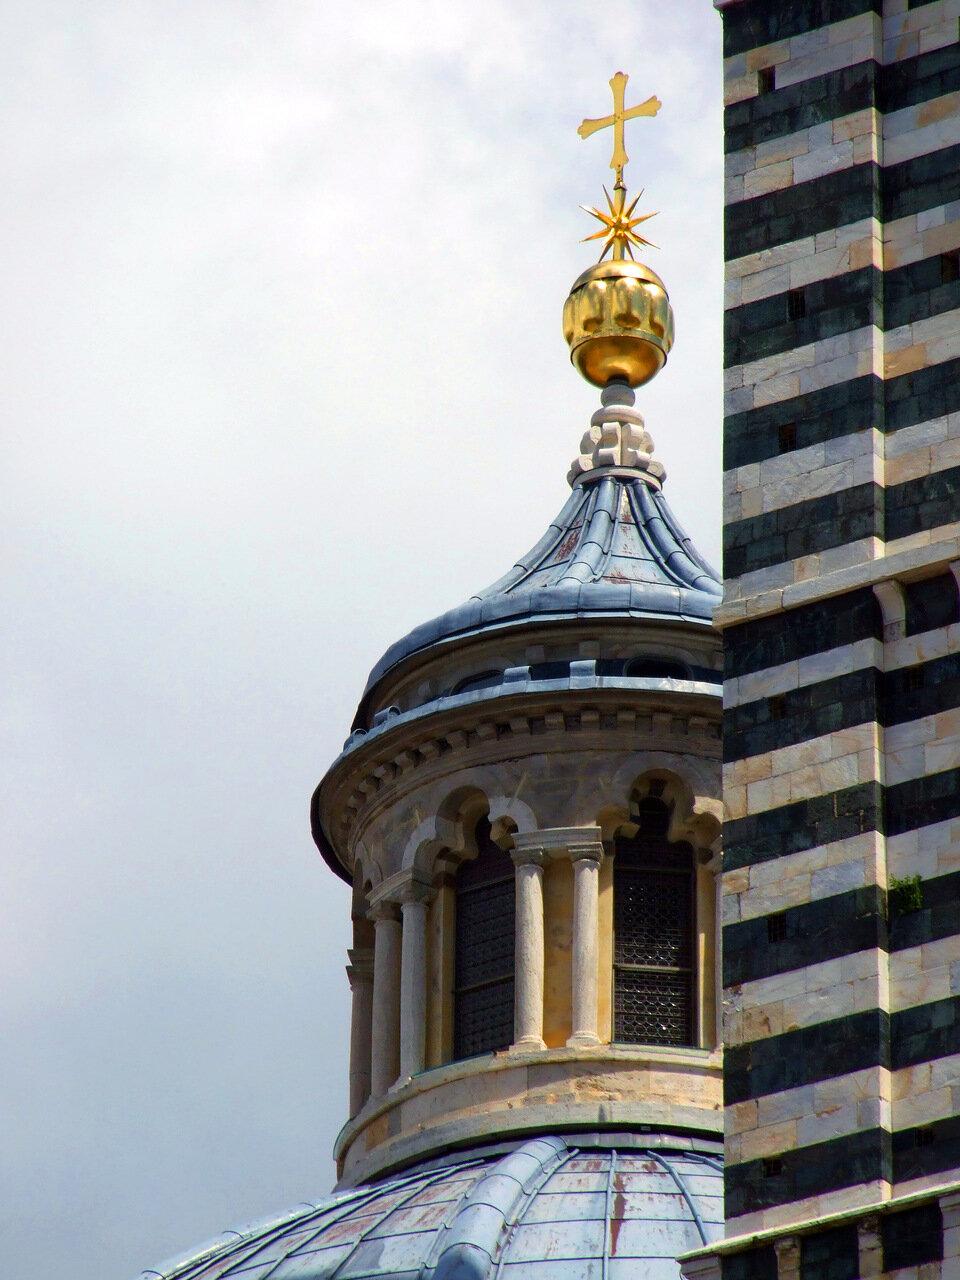 Фонарь на куполе Кафедрального Собора (Сattedrale di Santa Maria Assunta; Duomo di Siena)